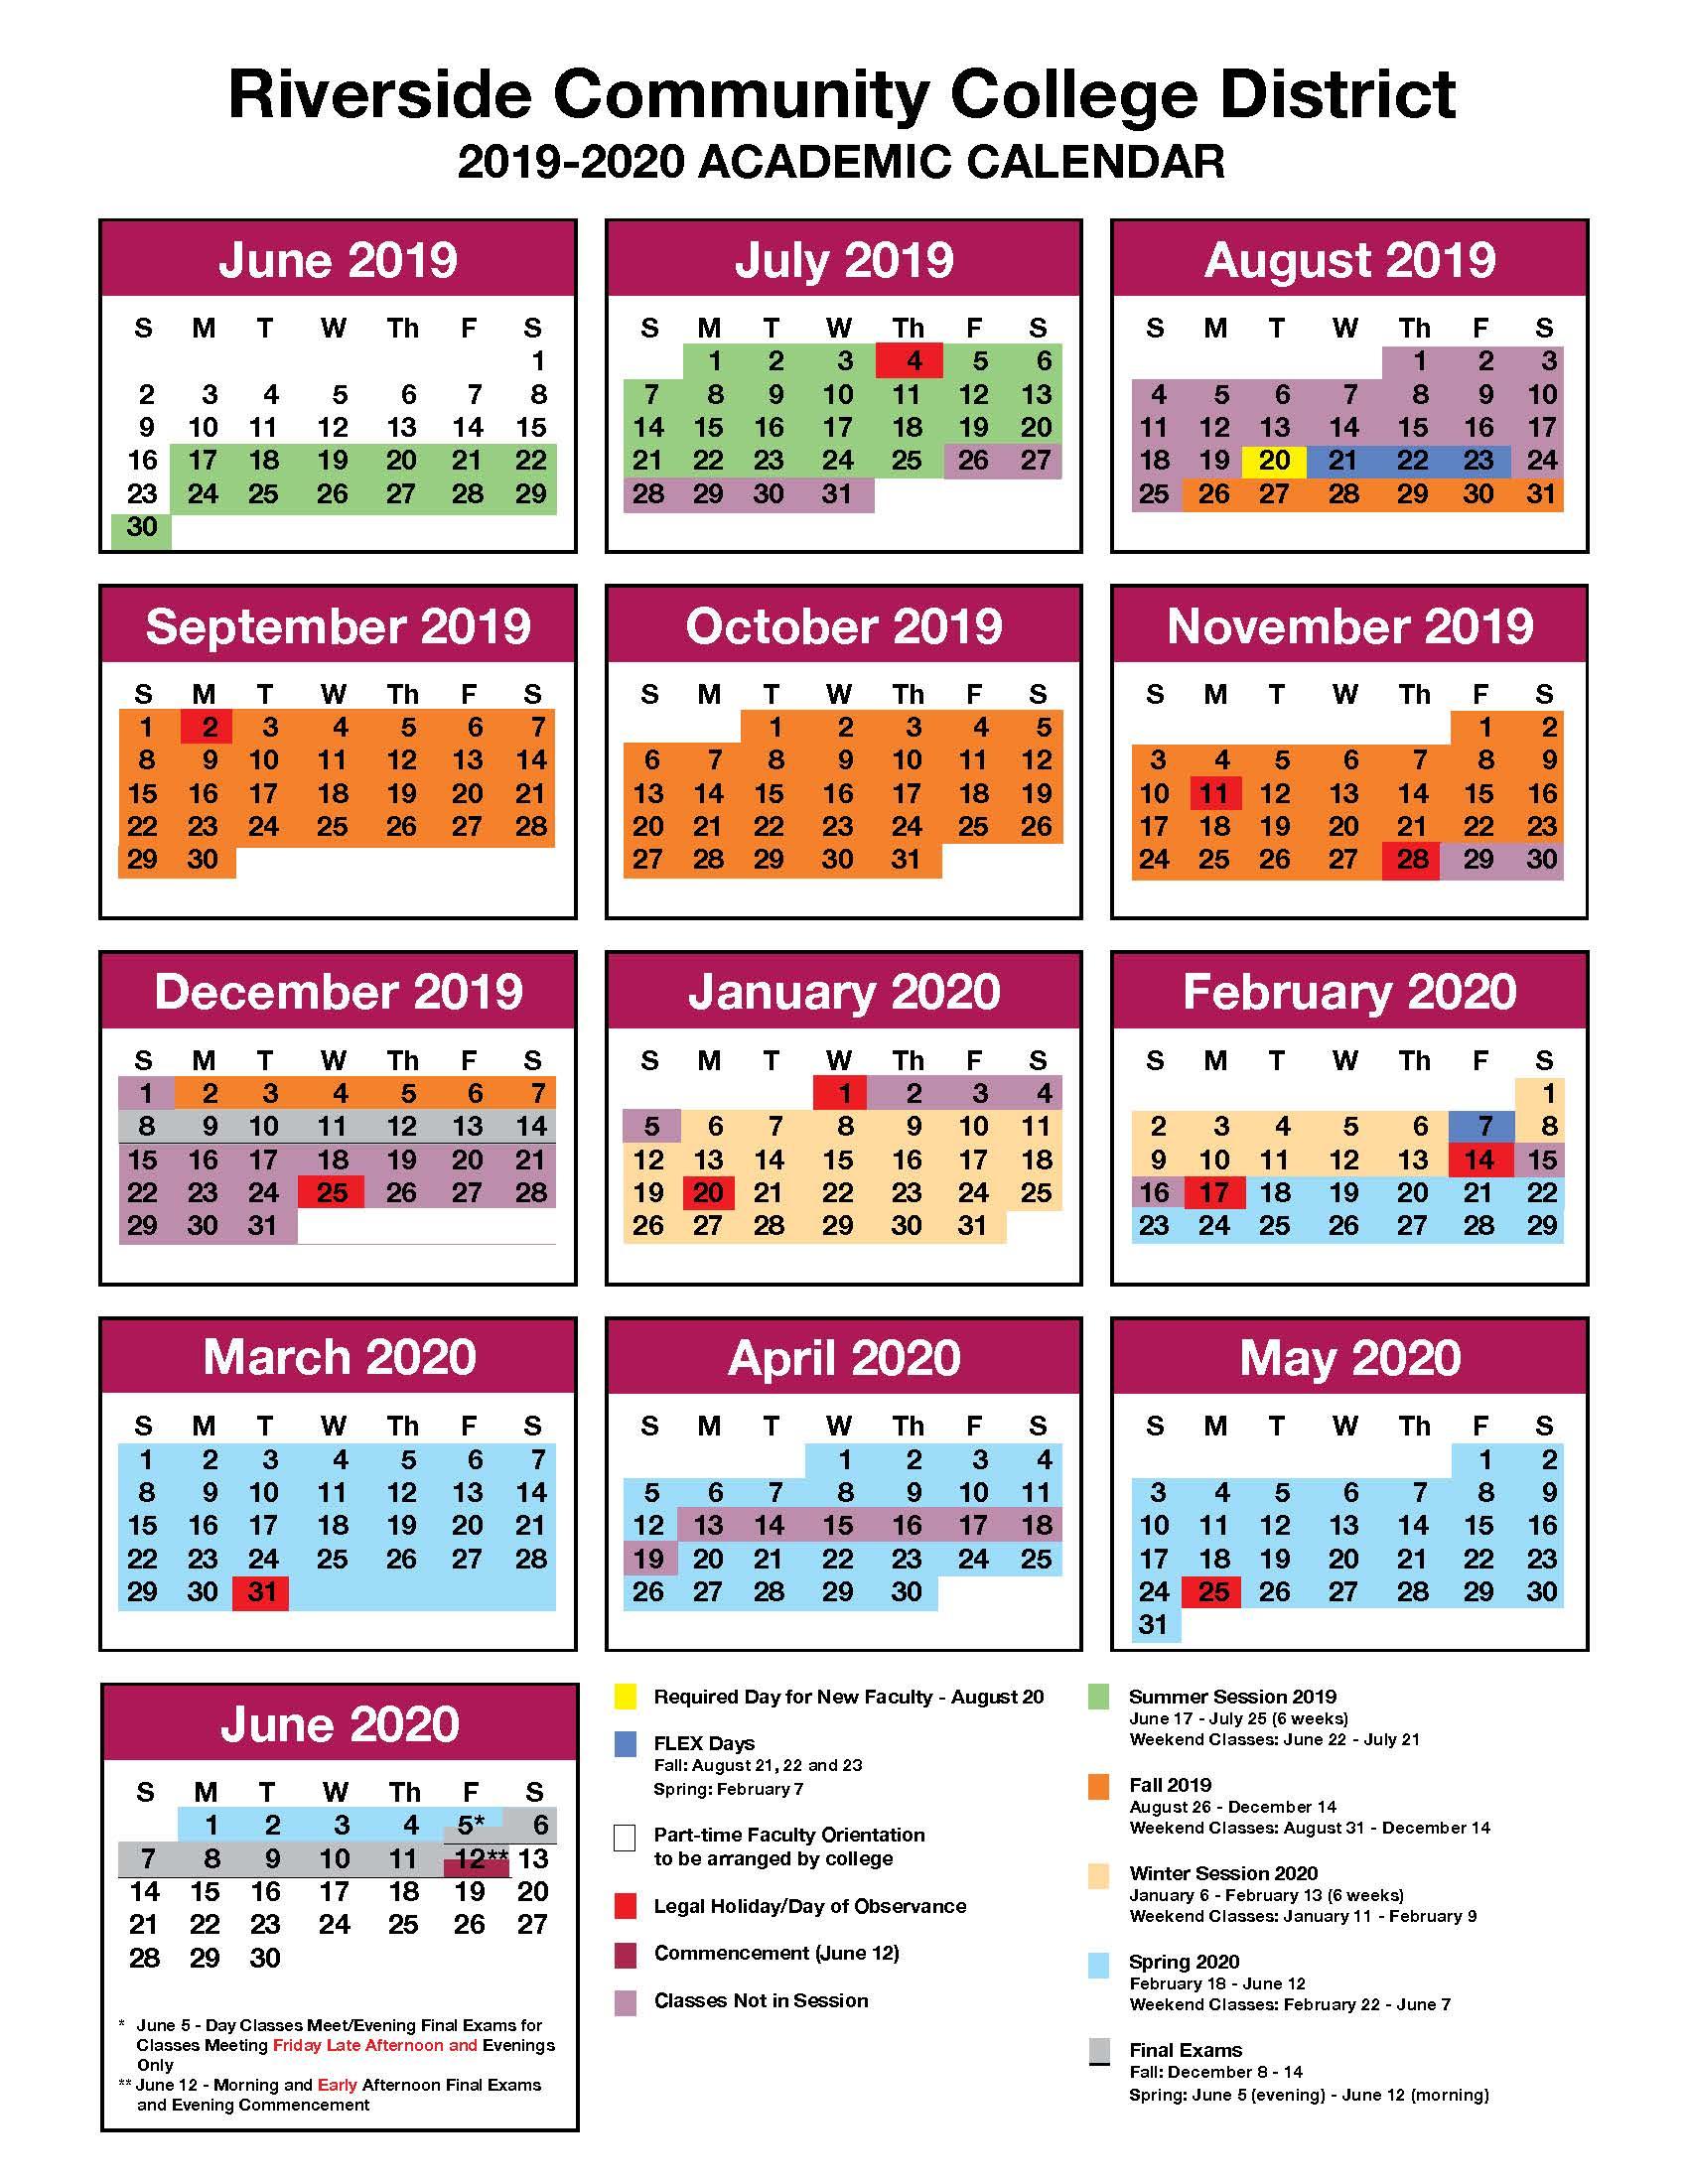 Jfk And Norco College Calendar 2019 2020 - John F. Kennedy Throughout Golden West College Winter Break Schedule 2021